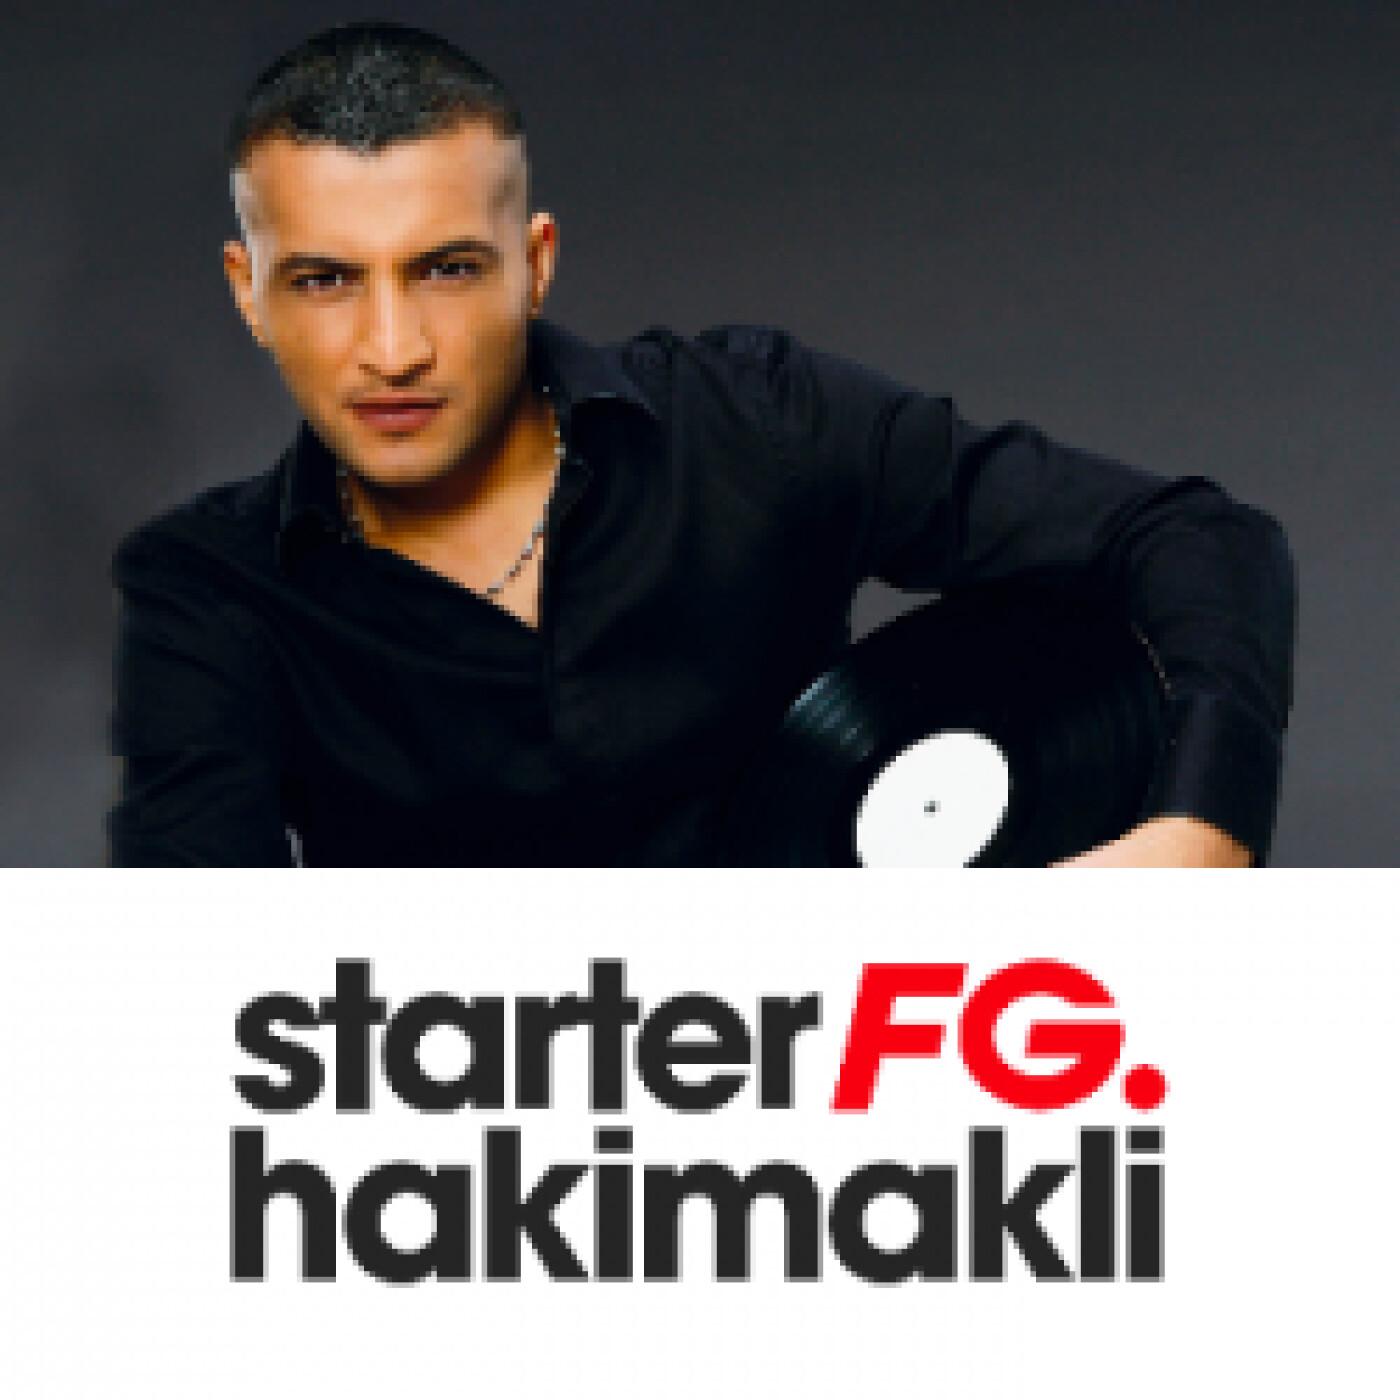 STARTER FG BY HAKIMAKLI MERCREDI 28 AVRIL 2021